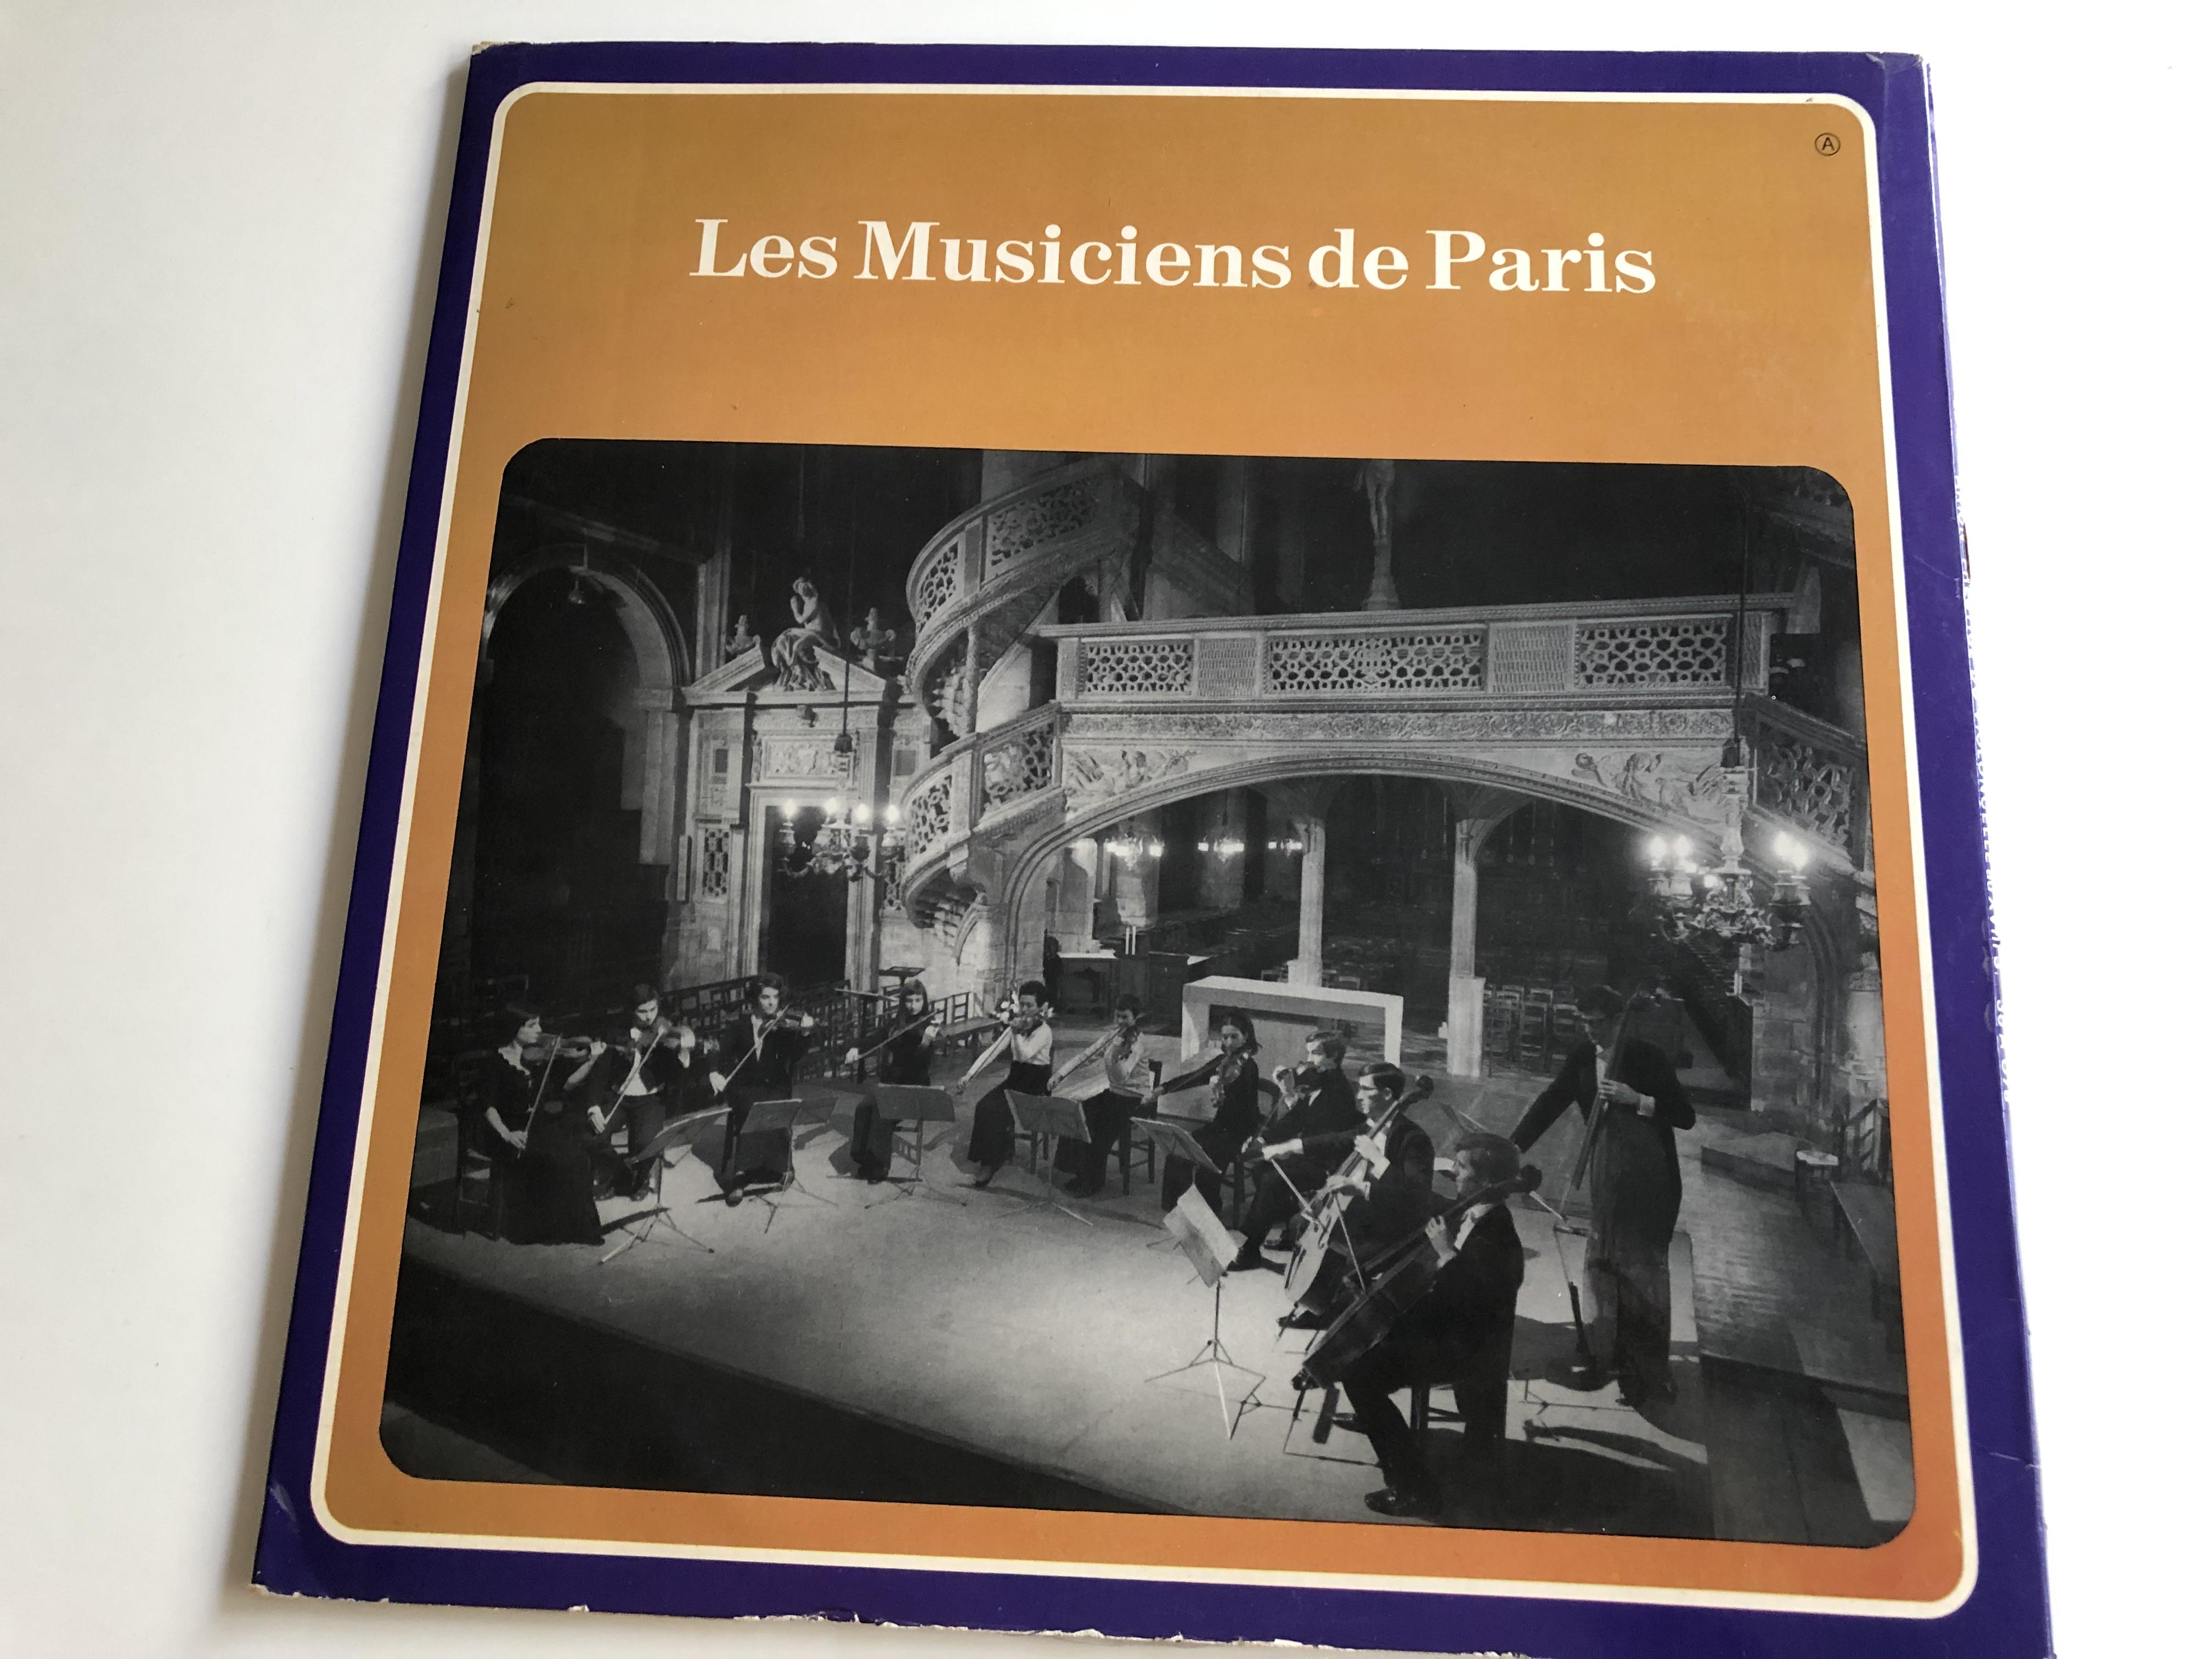 prestige-du-violoncelle-au-xviii-e-siecle-les-musiciens-de-paris-jean-chr-tien-bach-tomaso-albinoni-antonio-vivaldi-arion-30a078-lp-stereo-mono-5-.jpg